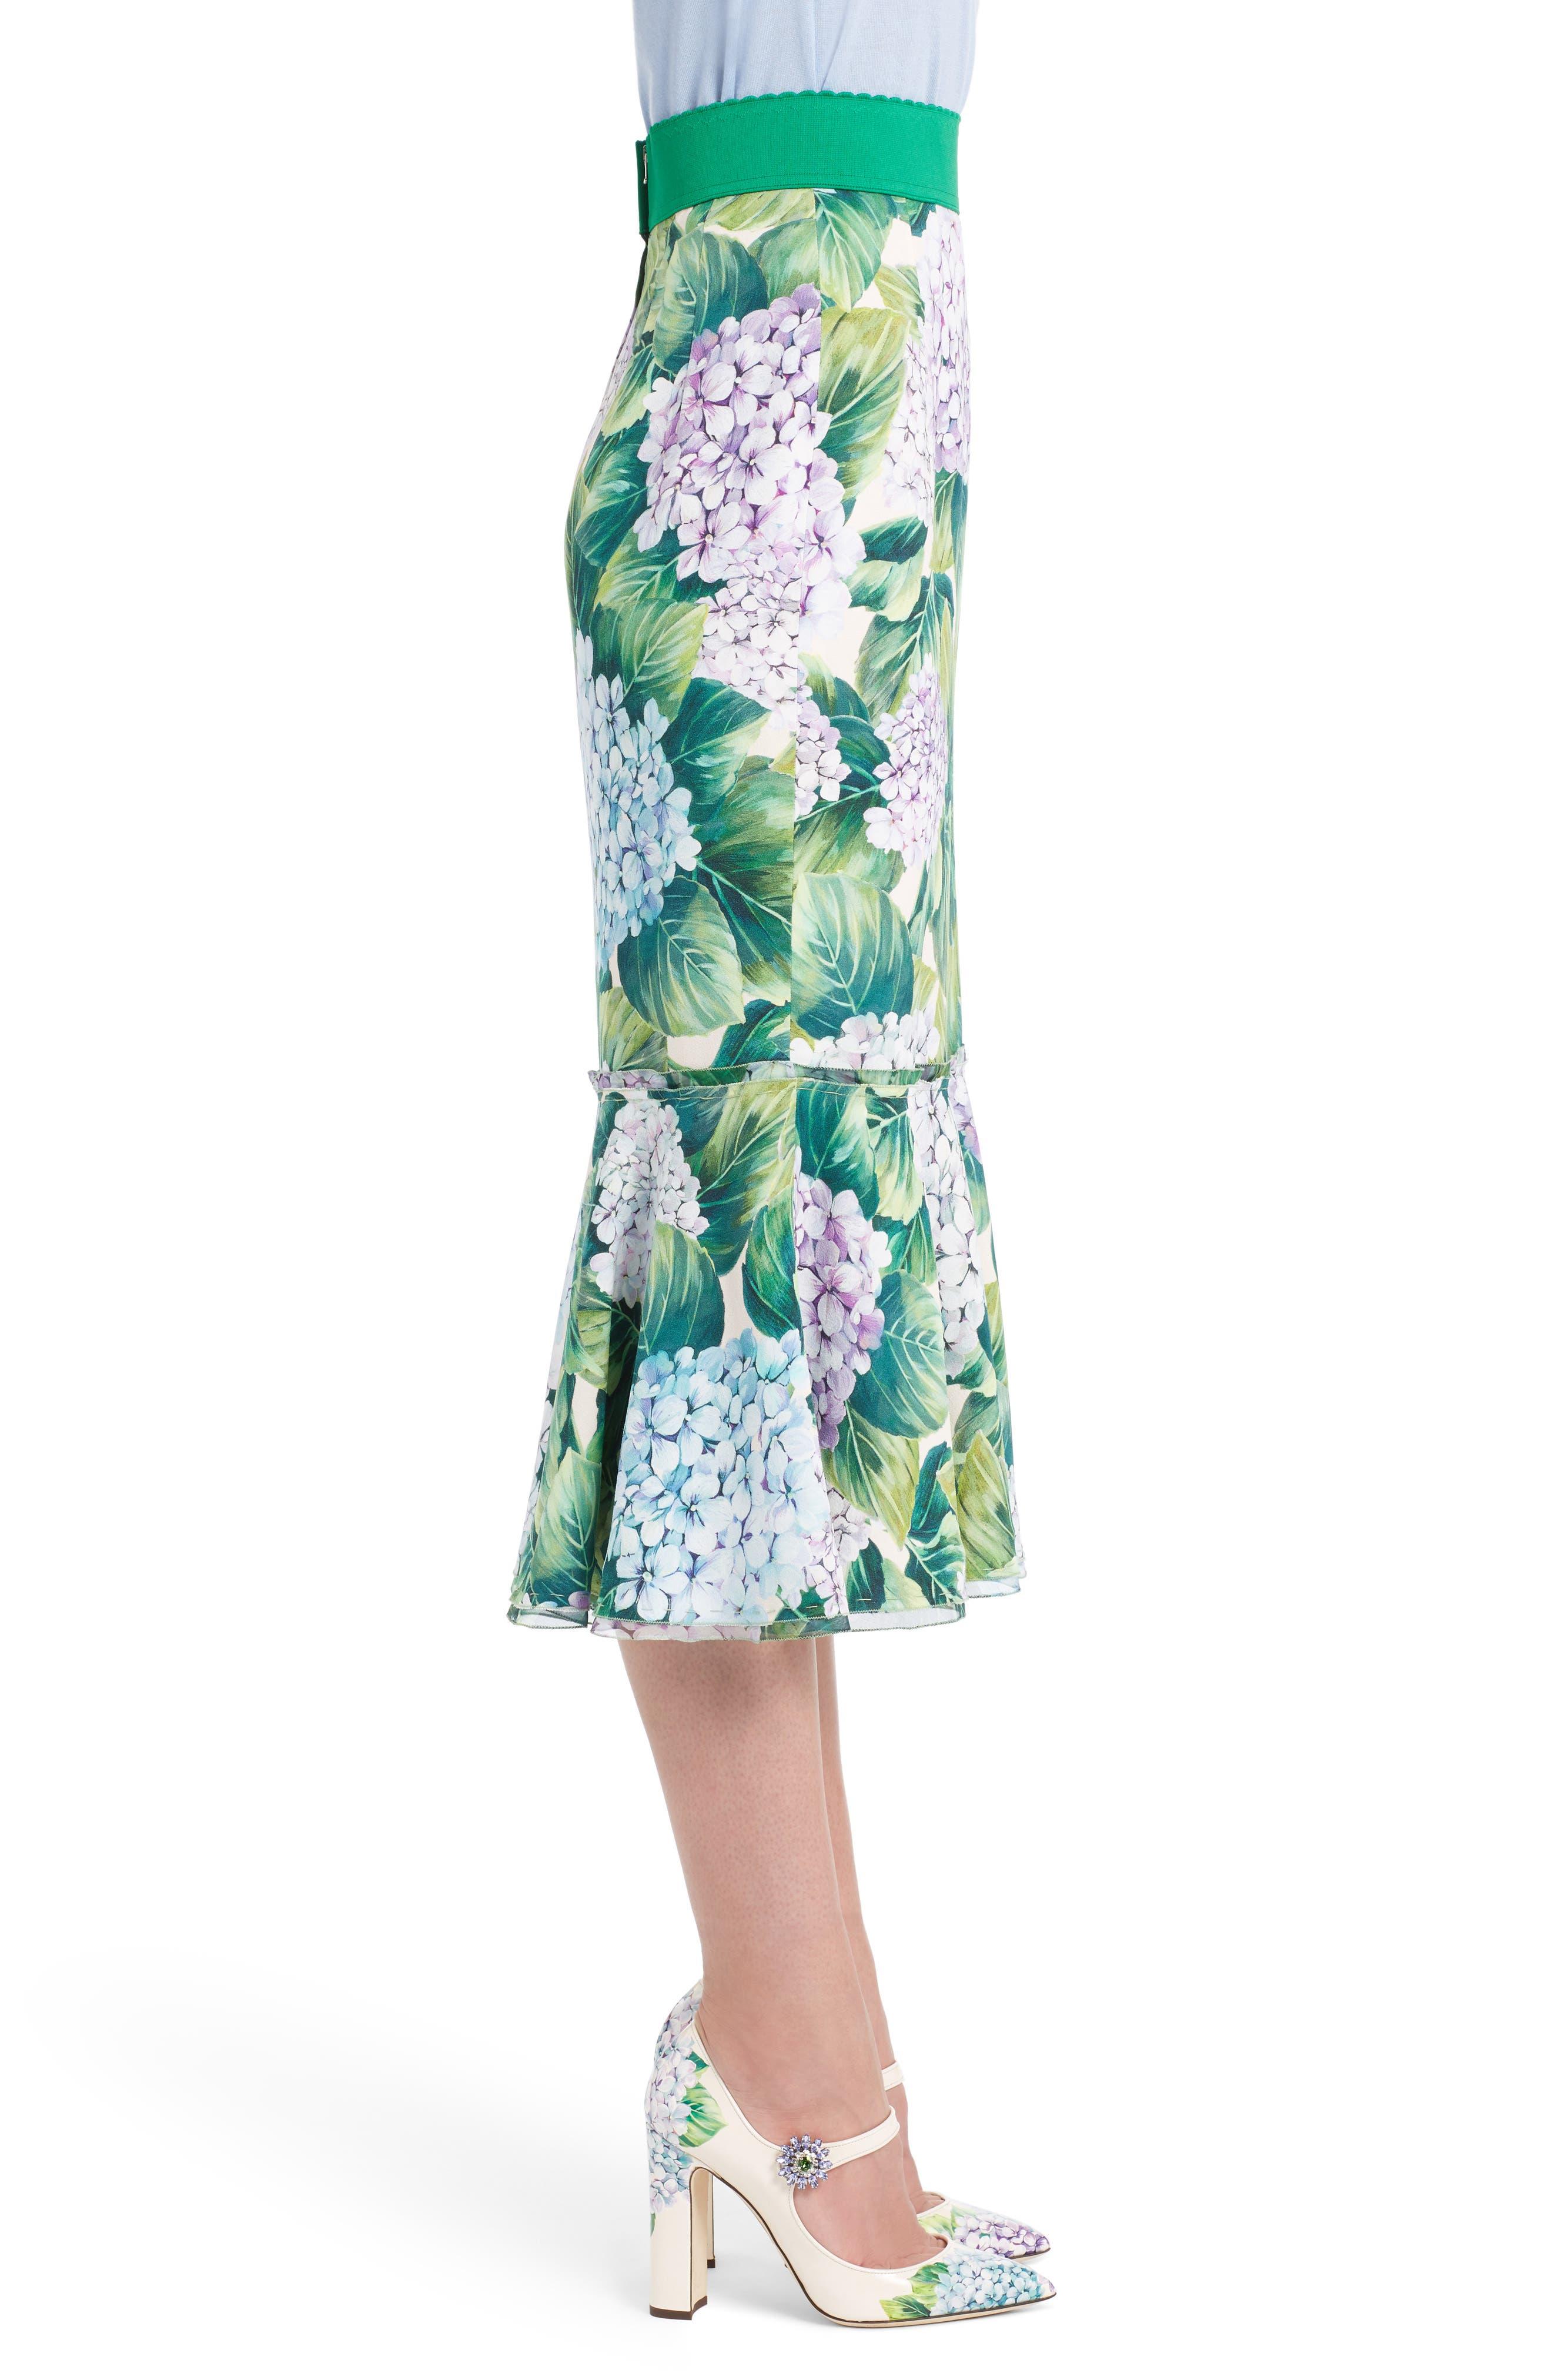 Hydrangea Print Ruffle Hem Skirt,                             Alternate thumbnail 3, color,                             300